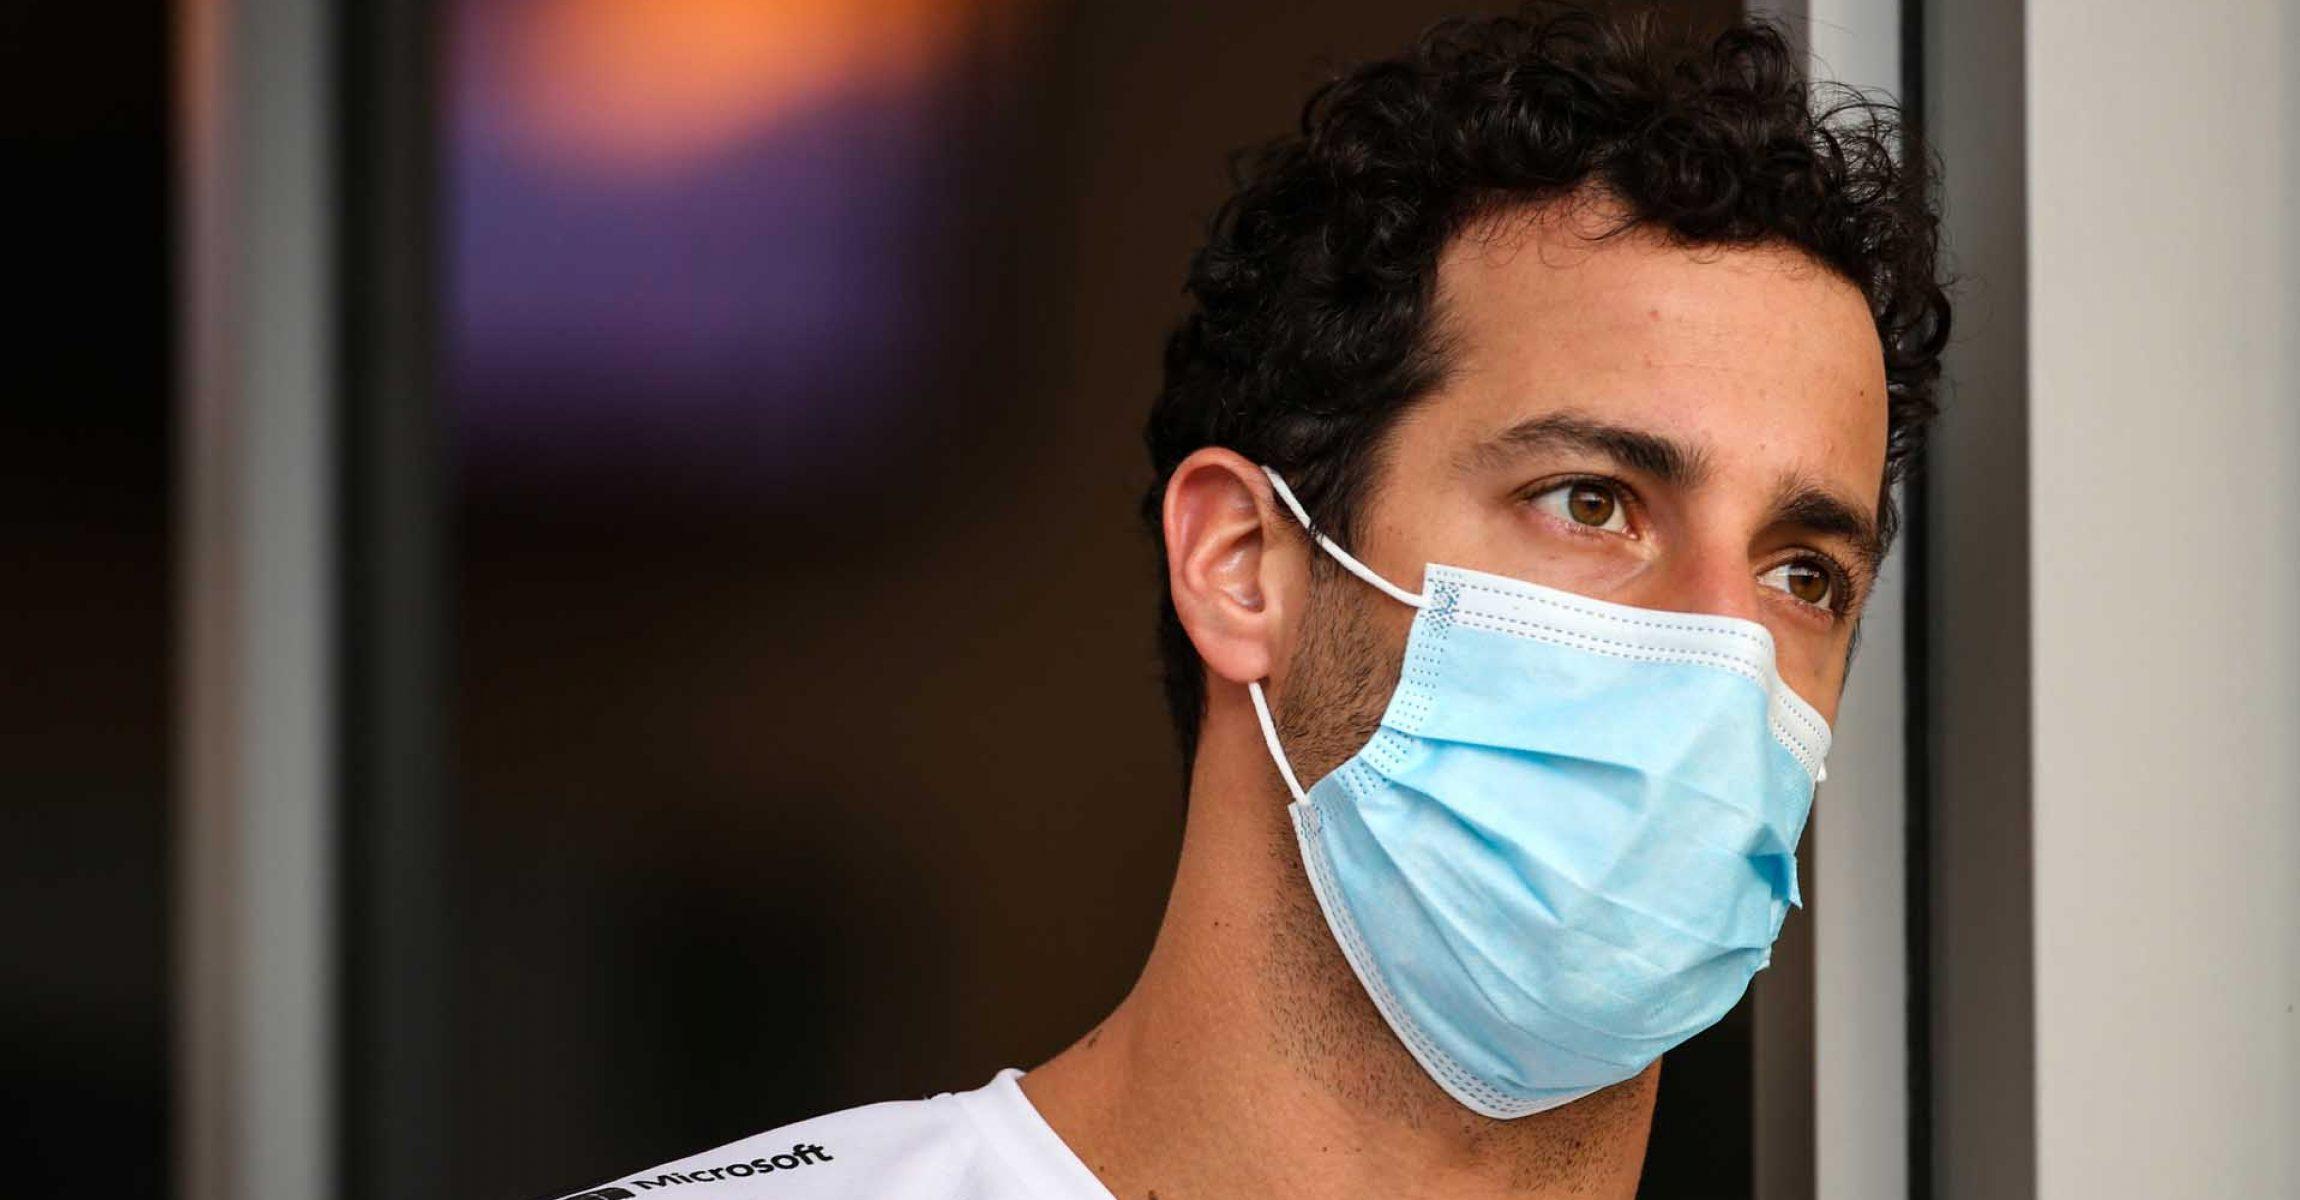 Daniel Ricciardo (AUS) Renault F1 Team. Sakhir Grand Prix, Thursday 3rd December 2020. Sakhir, Bahrain.